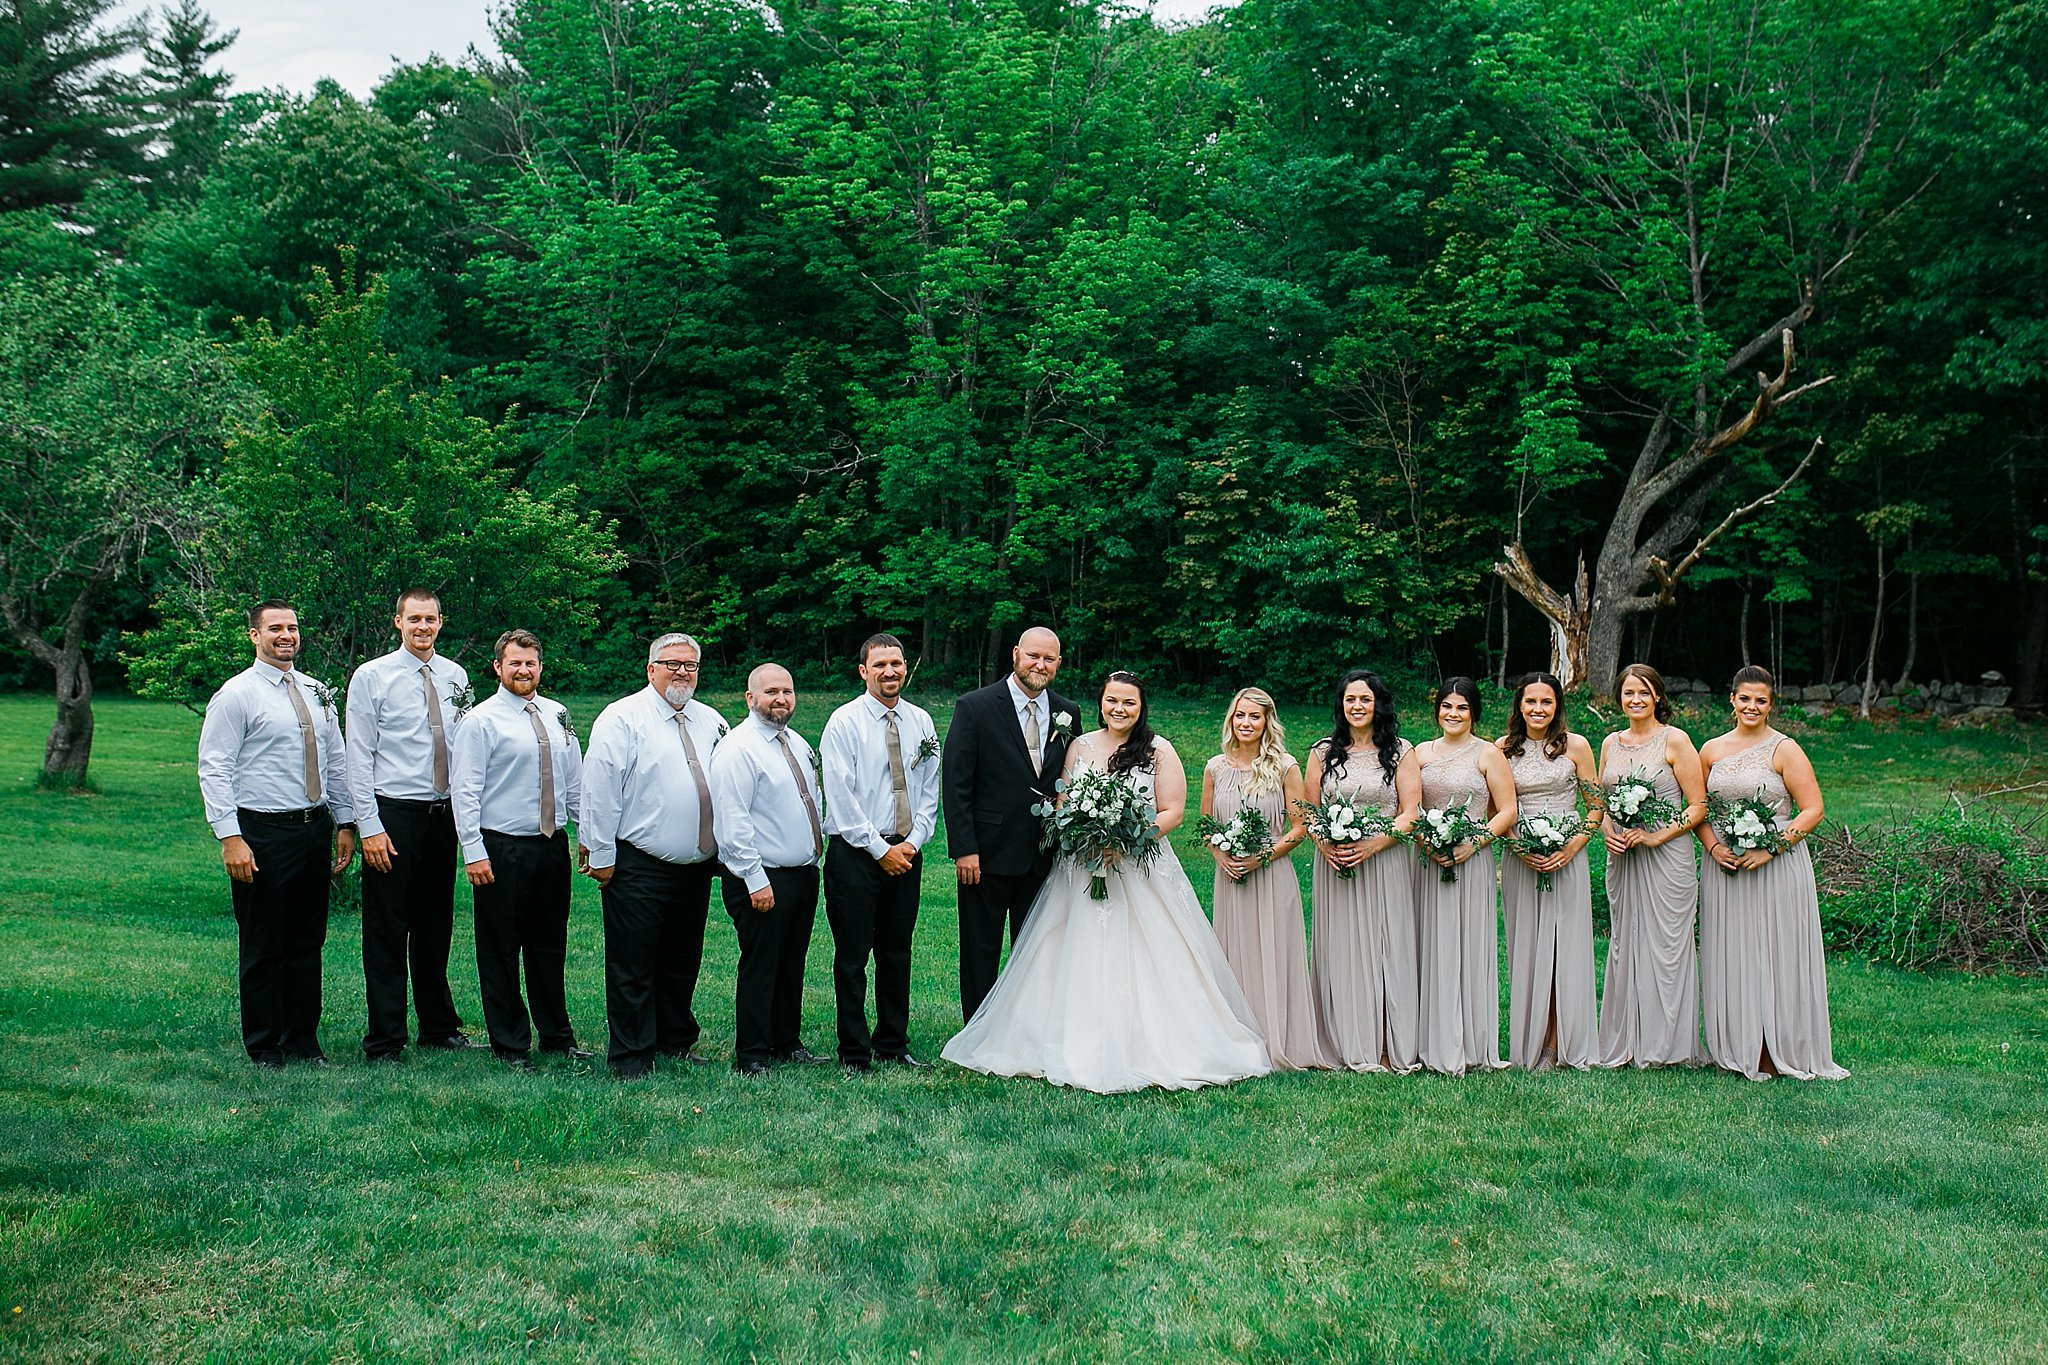 Preserve at Chocorua Tamworth NH Wedding May Wedding New Hampshire Wedding 51.jpg